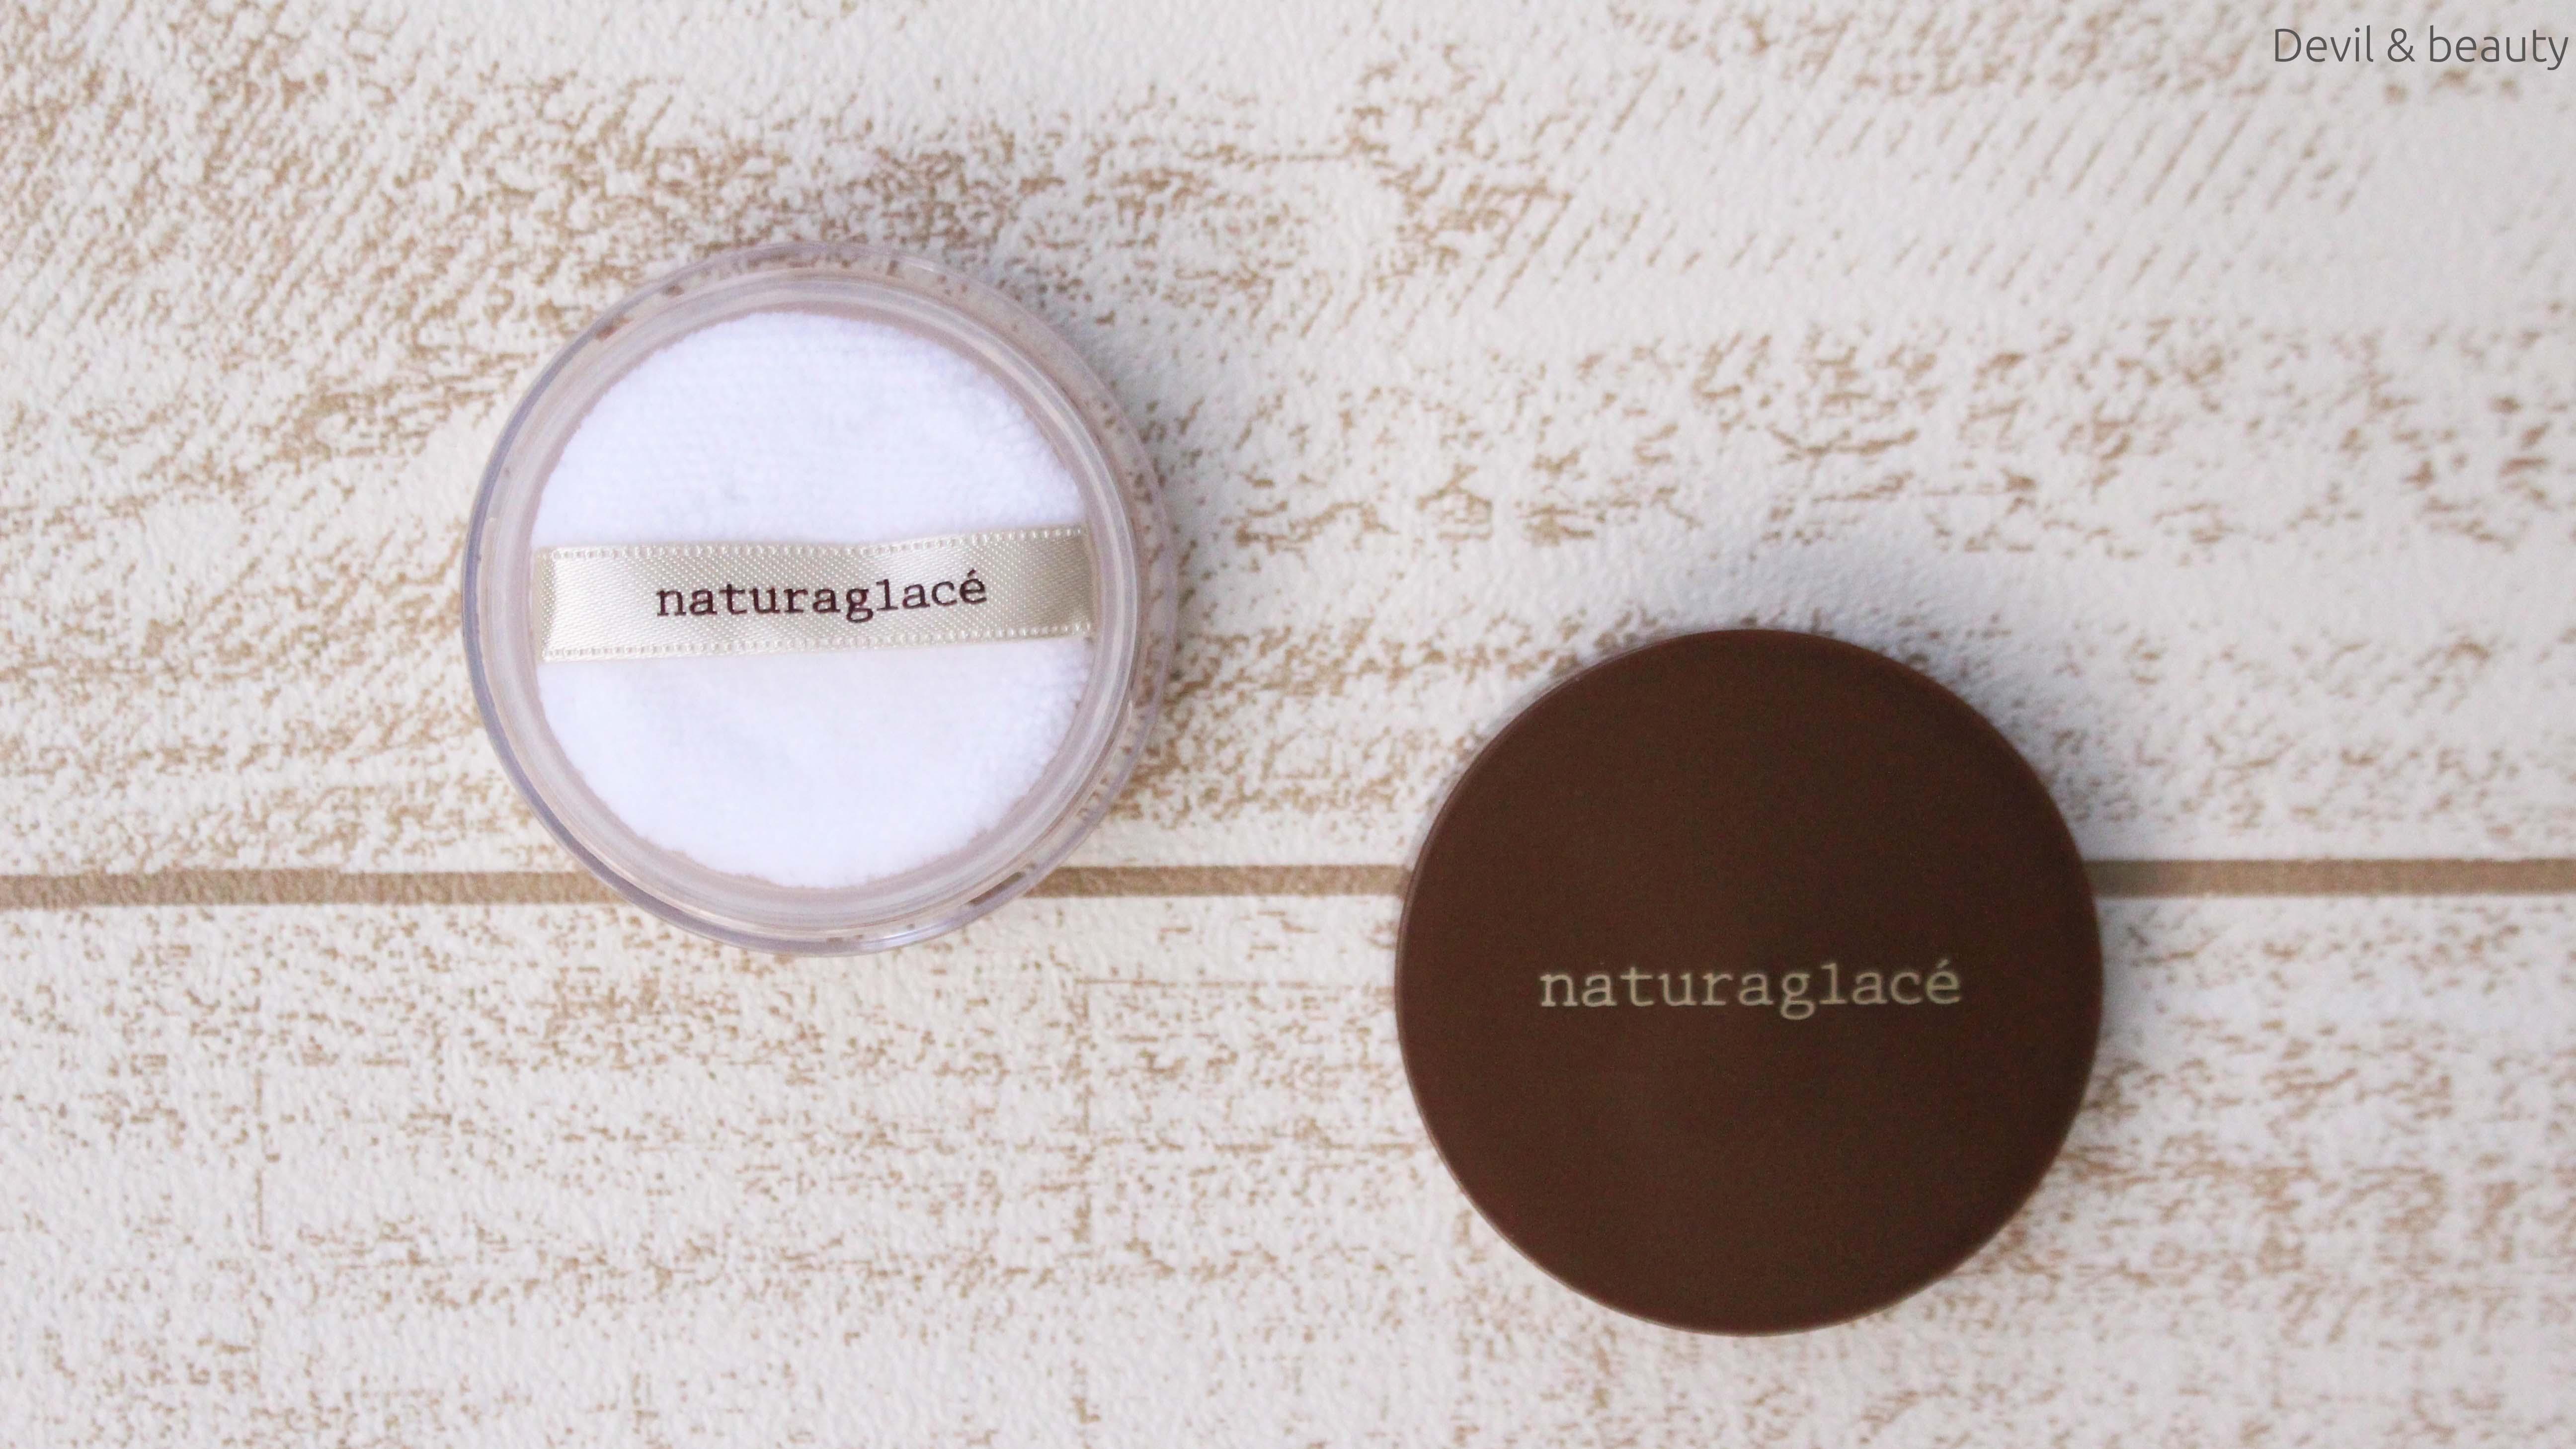 natura-glace-marshmallow-powder7 - image